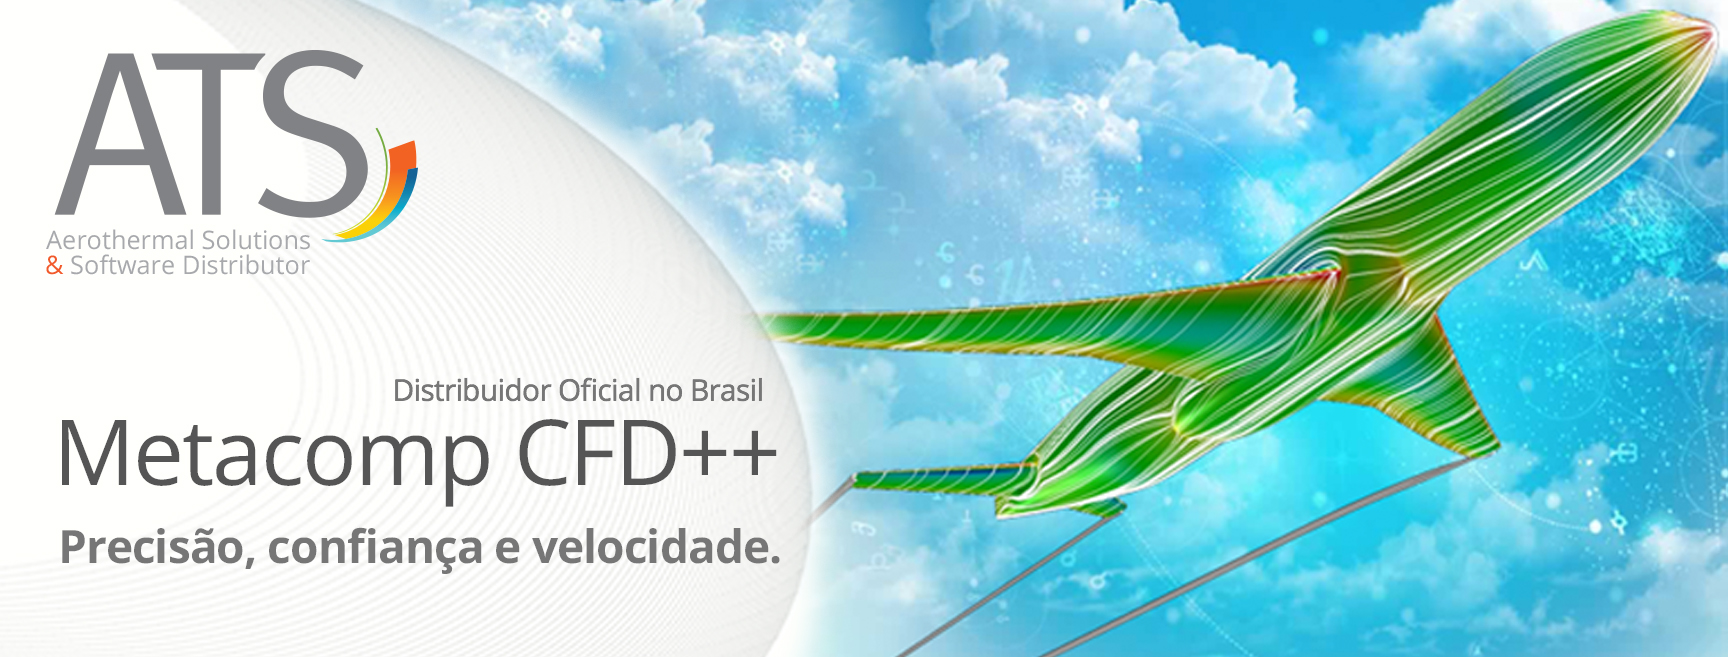 ATS - Aerothermal Solutions, Distribuidor Exclusivo Ennova Meshing no Brasil